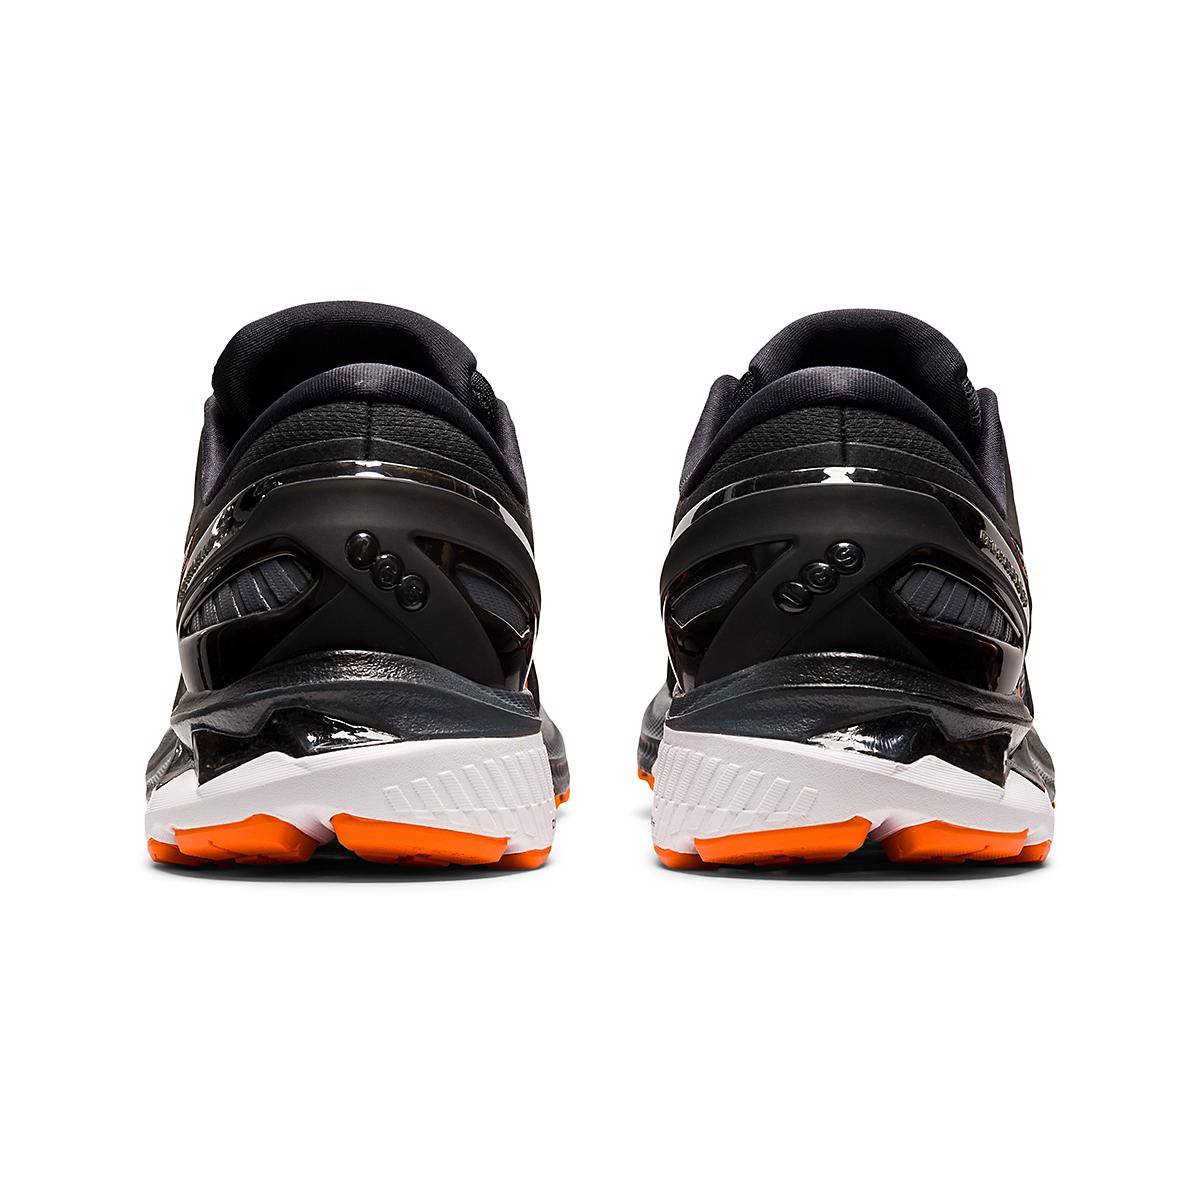 Men's Asics GEL-Kayano 27 Running Shoe - Color: Black/Marigold - Size: 7.5 - Width: Regular, Black/Marigold, large, image 6